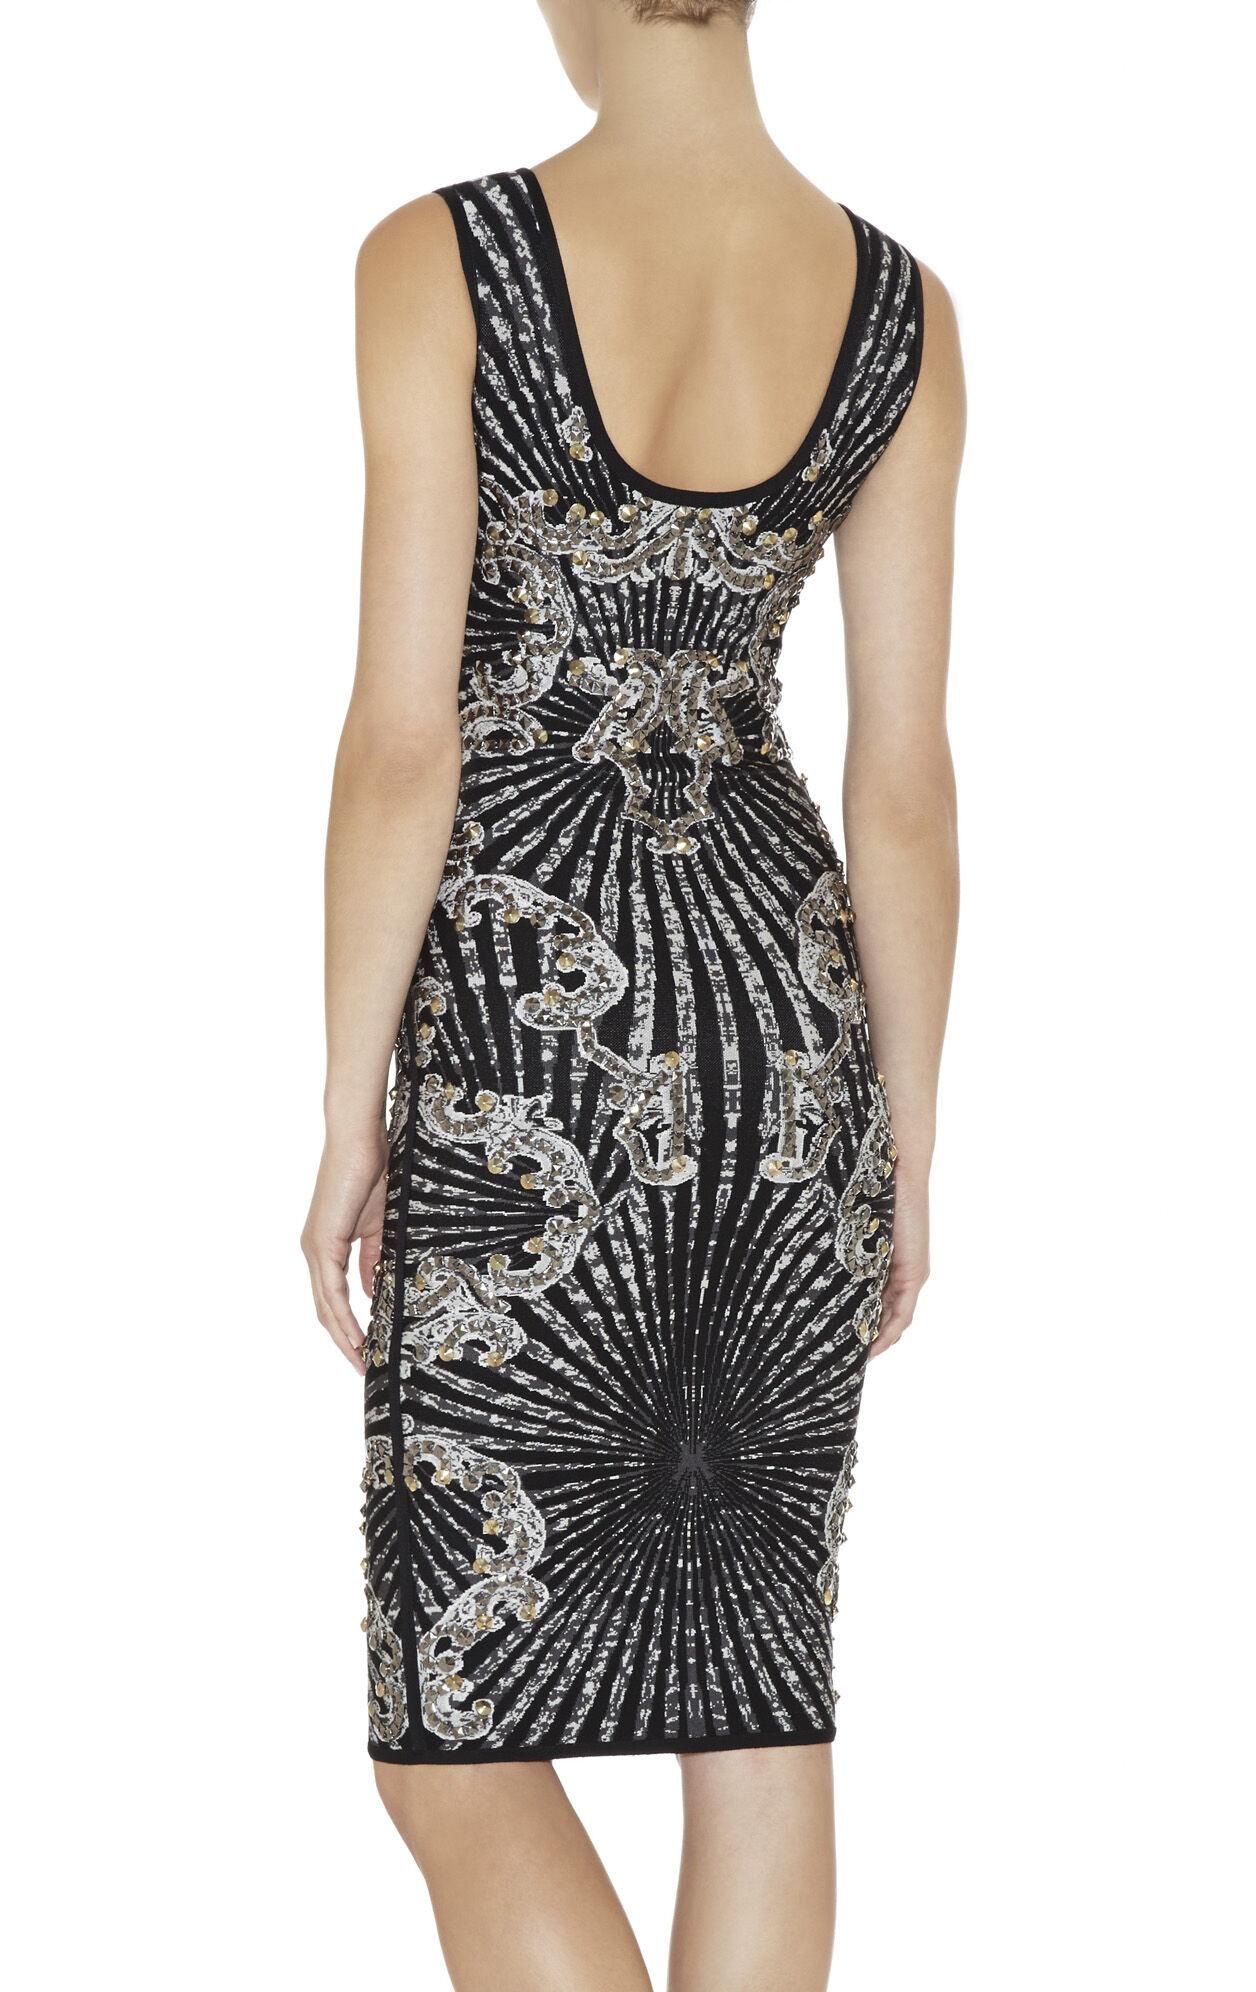 Alisa Scroll Jacquard Studded Dress